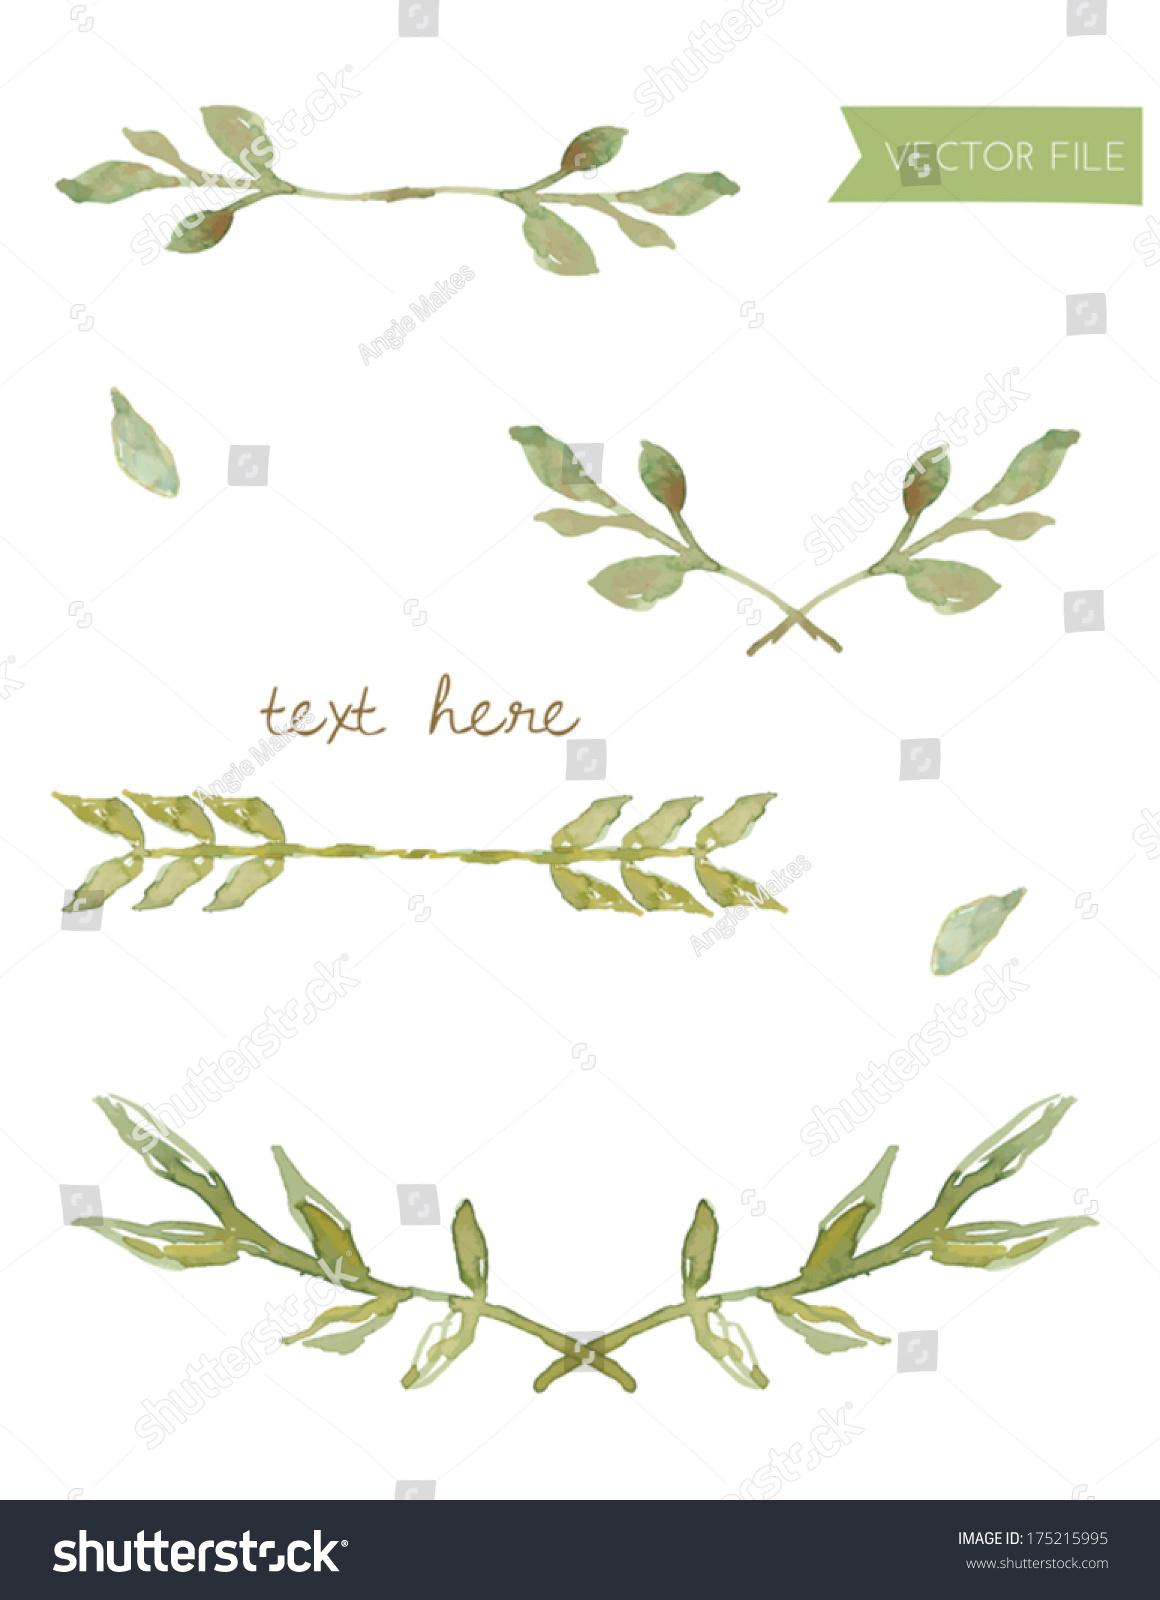 Vector watercolor laurels leaves watercolor branches stock for Watercolor greenery